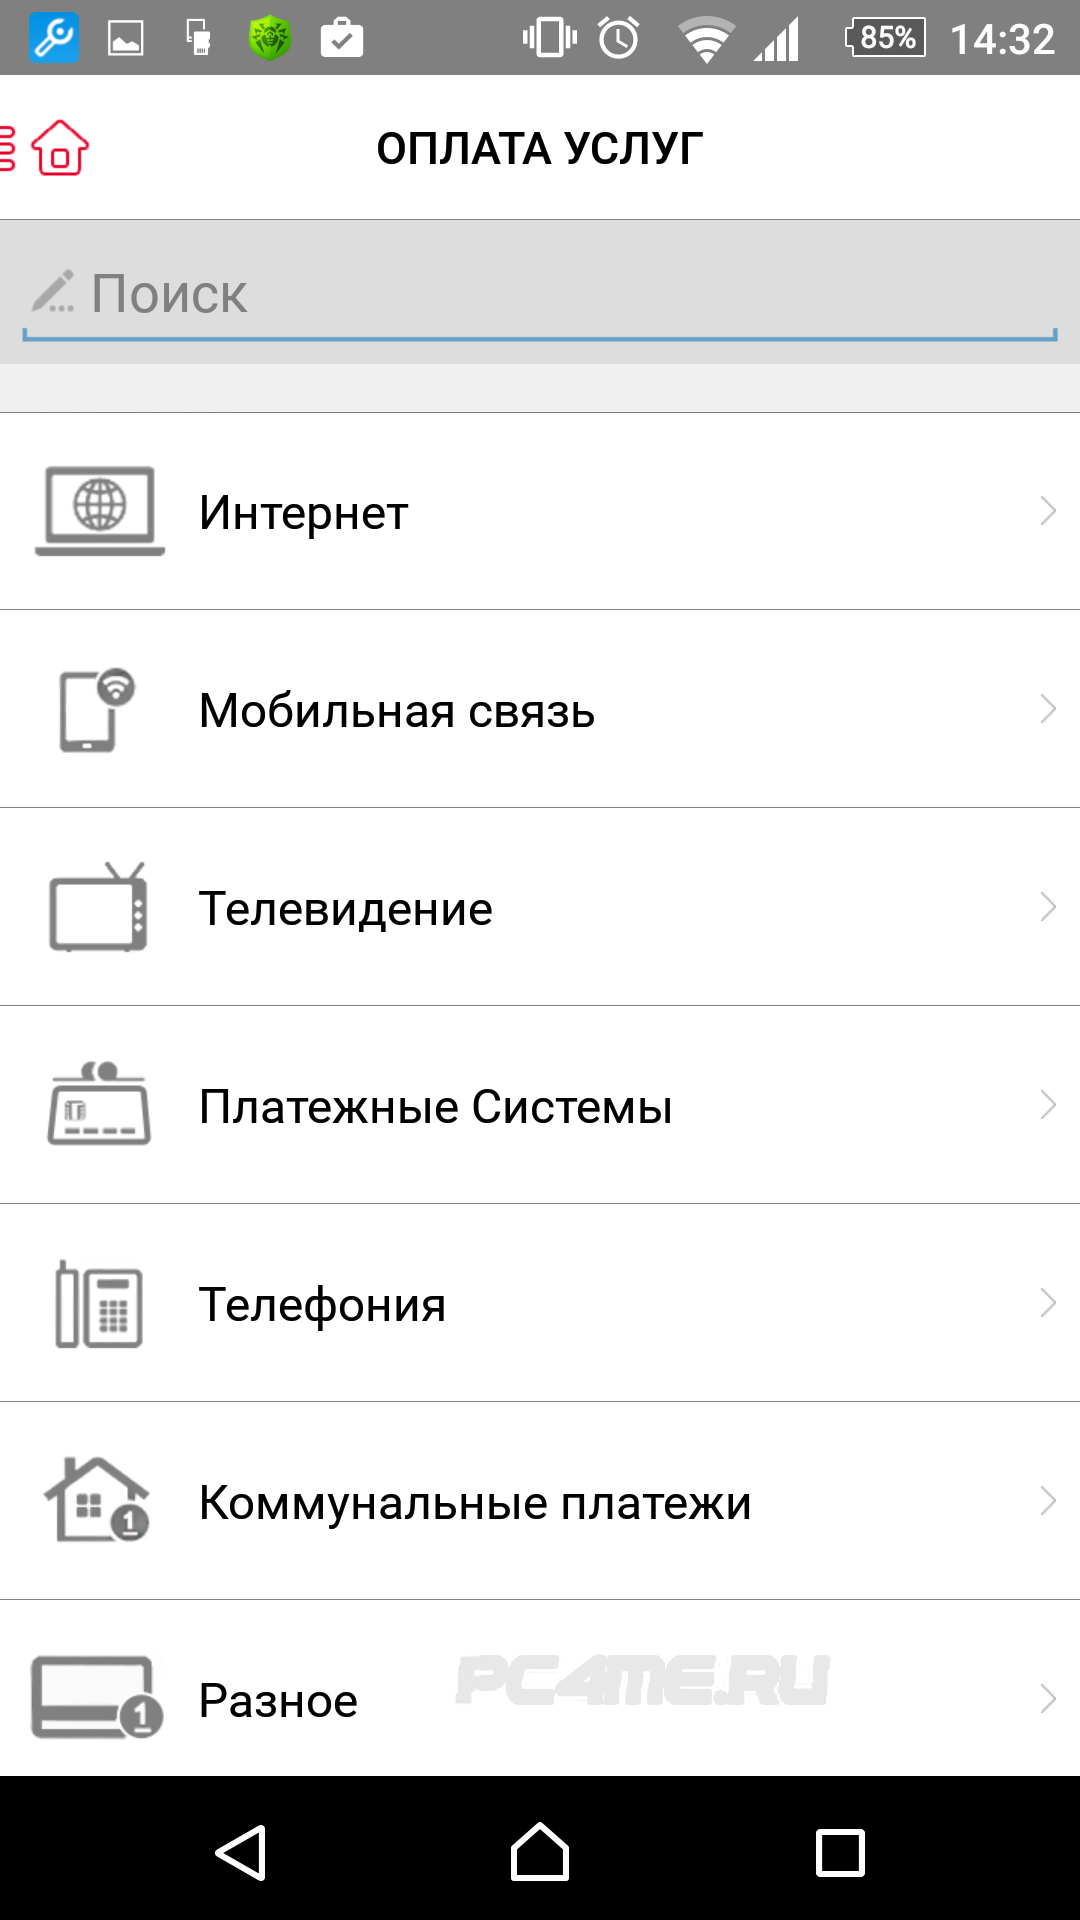 Screenshot_2016-09-13-14-32-34